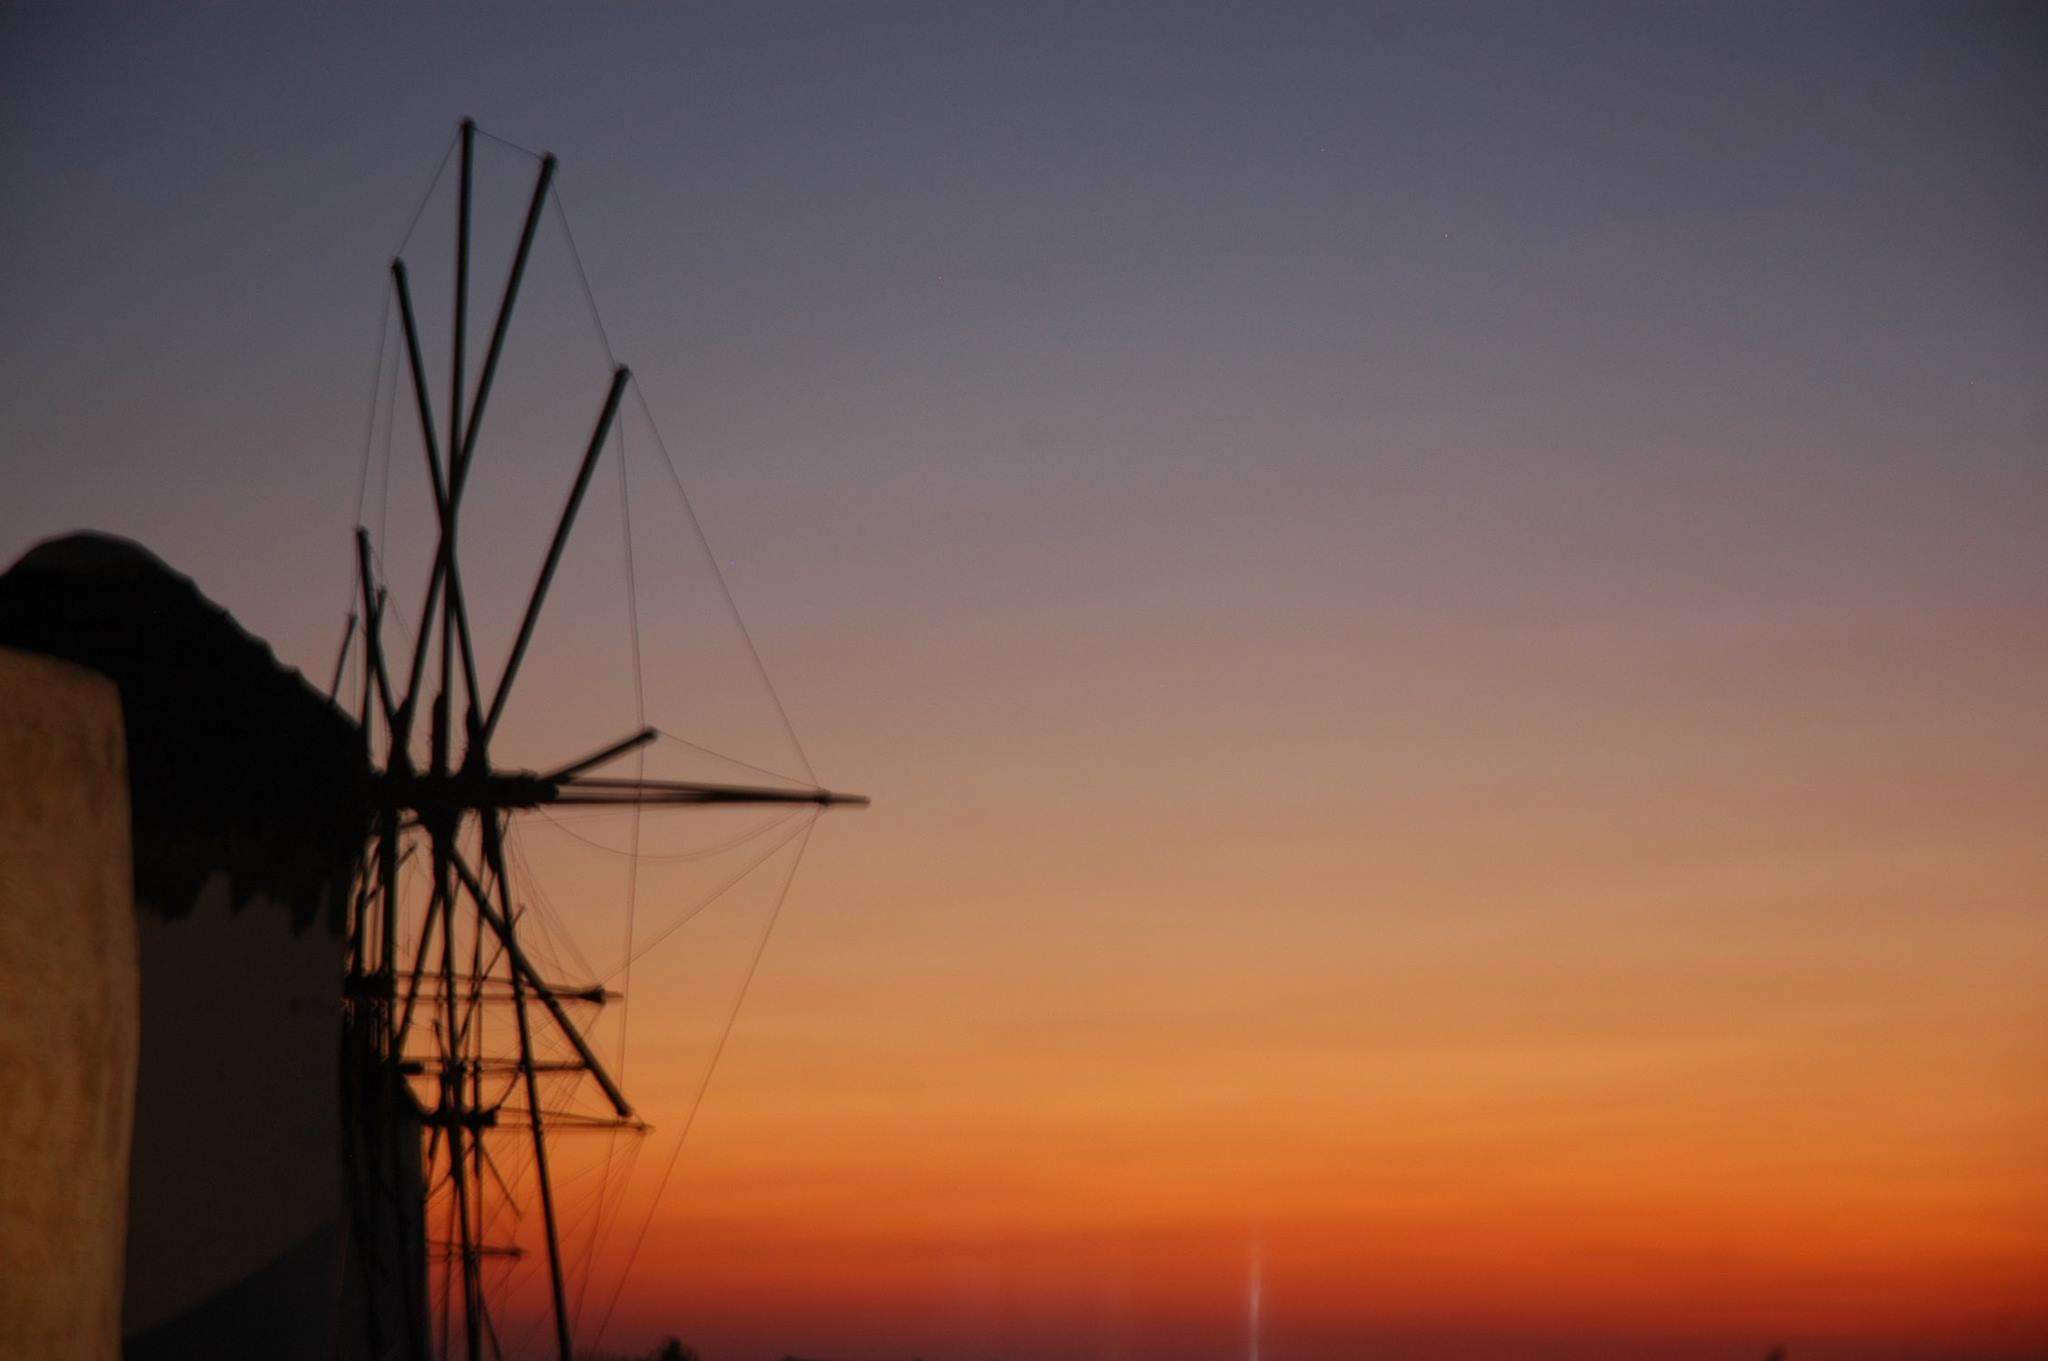 A Mykonos windmill at sunset